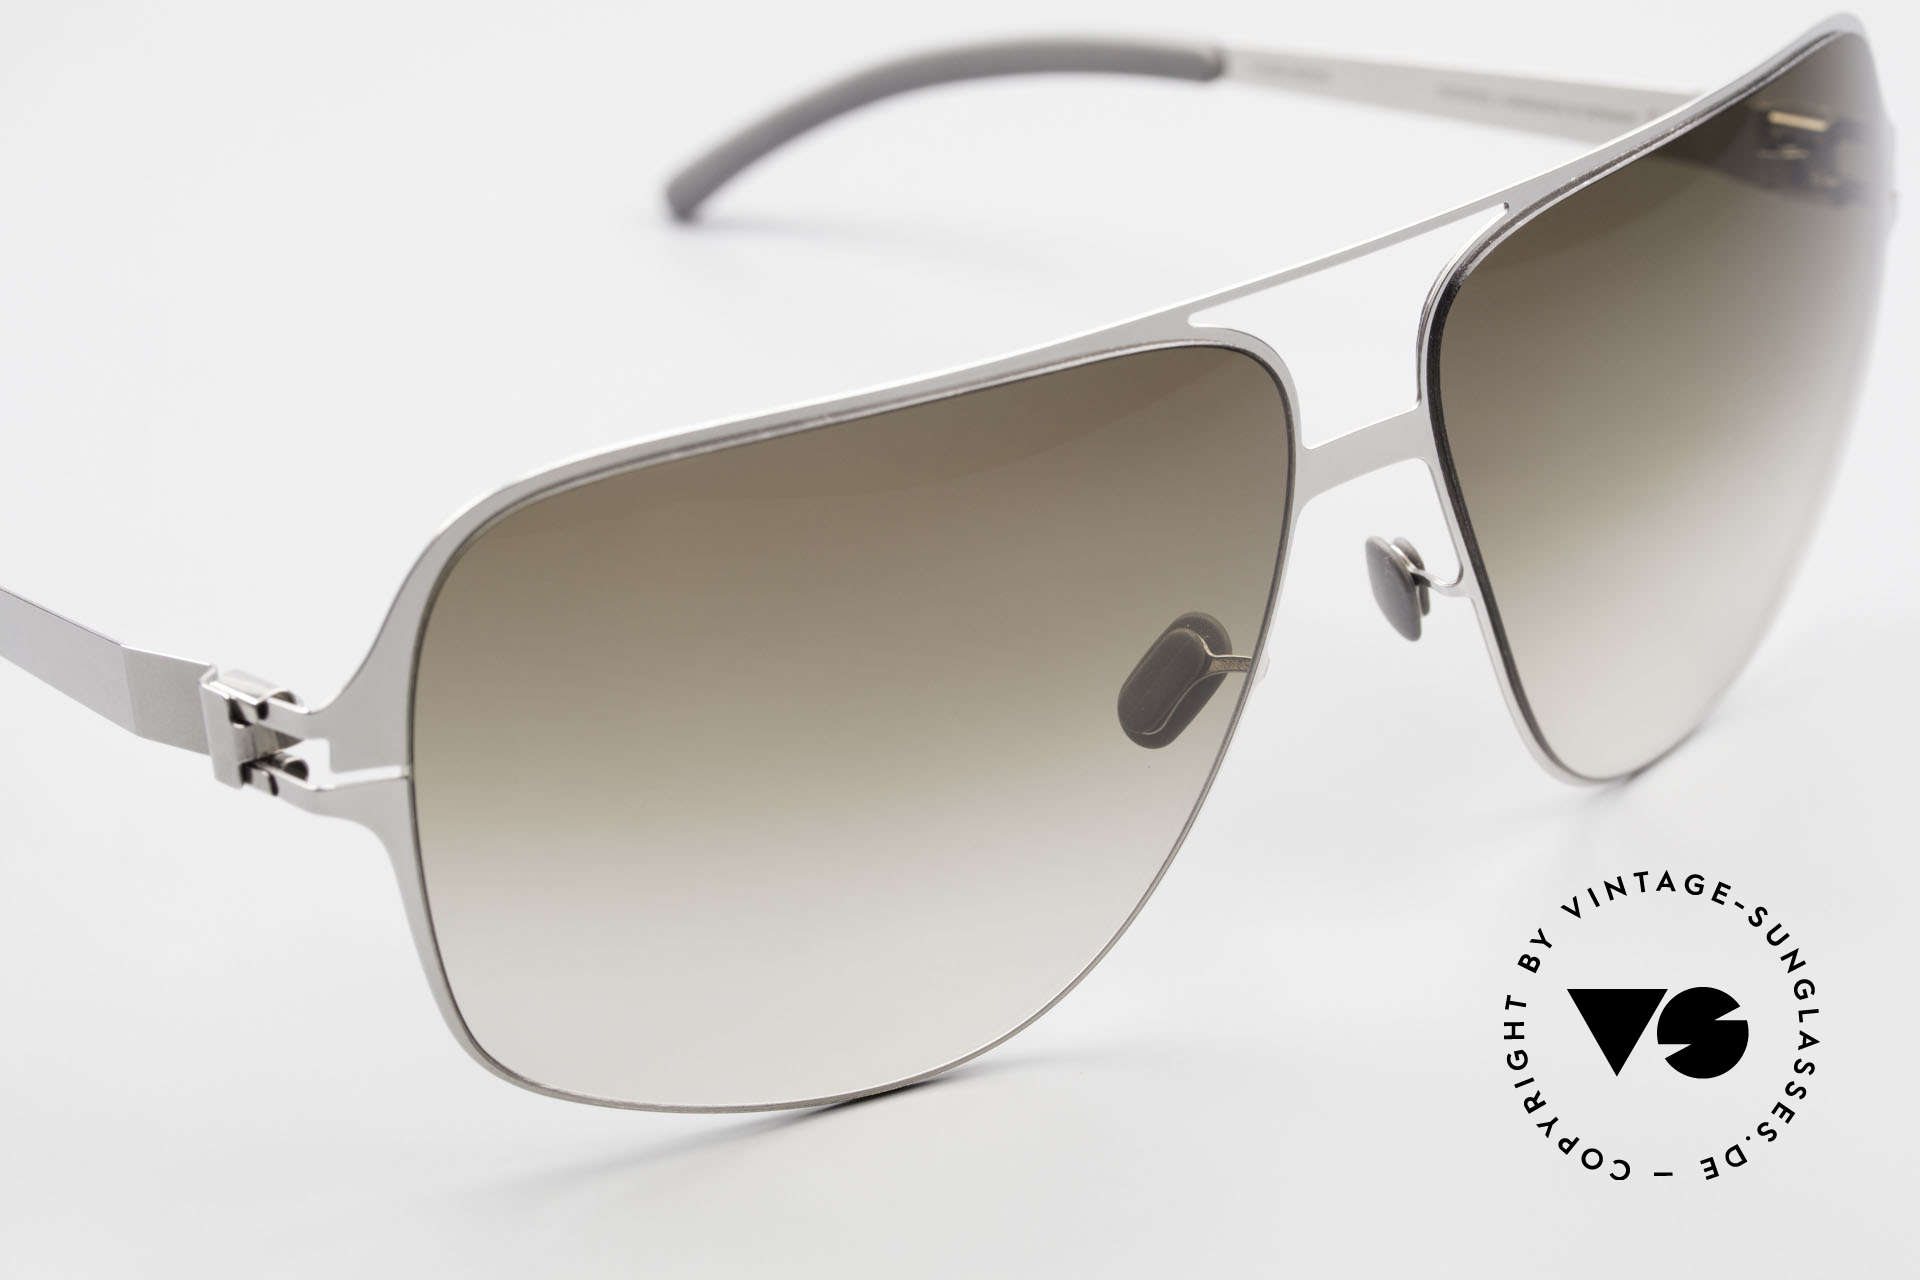 Mykita Cassius Lenny Kravitz Sunglasses XXL, top-notch quality, made in Germany (Berlin-Kreuzberg), Made for Men